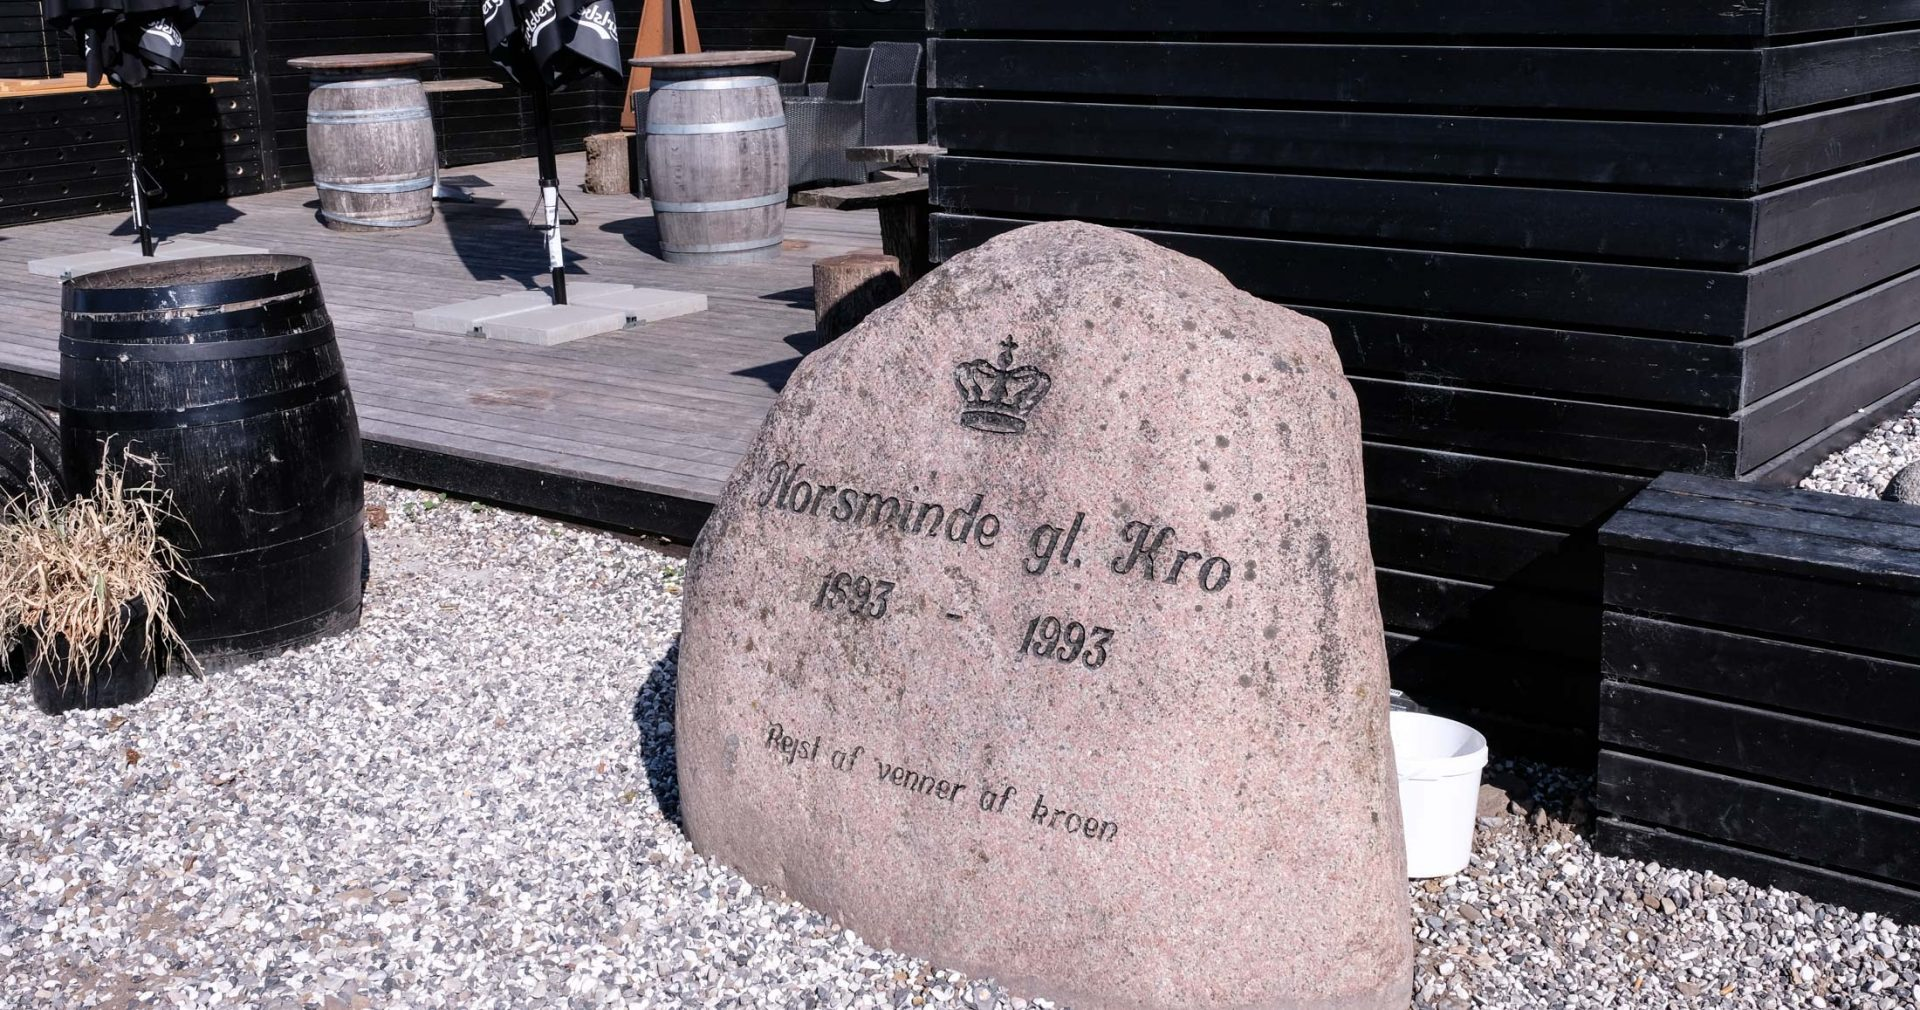 Moden og velholdt: Norsminde Kro fylder 325 år med stil